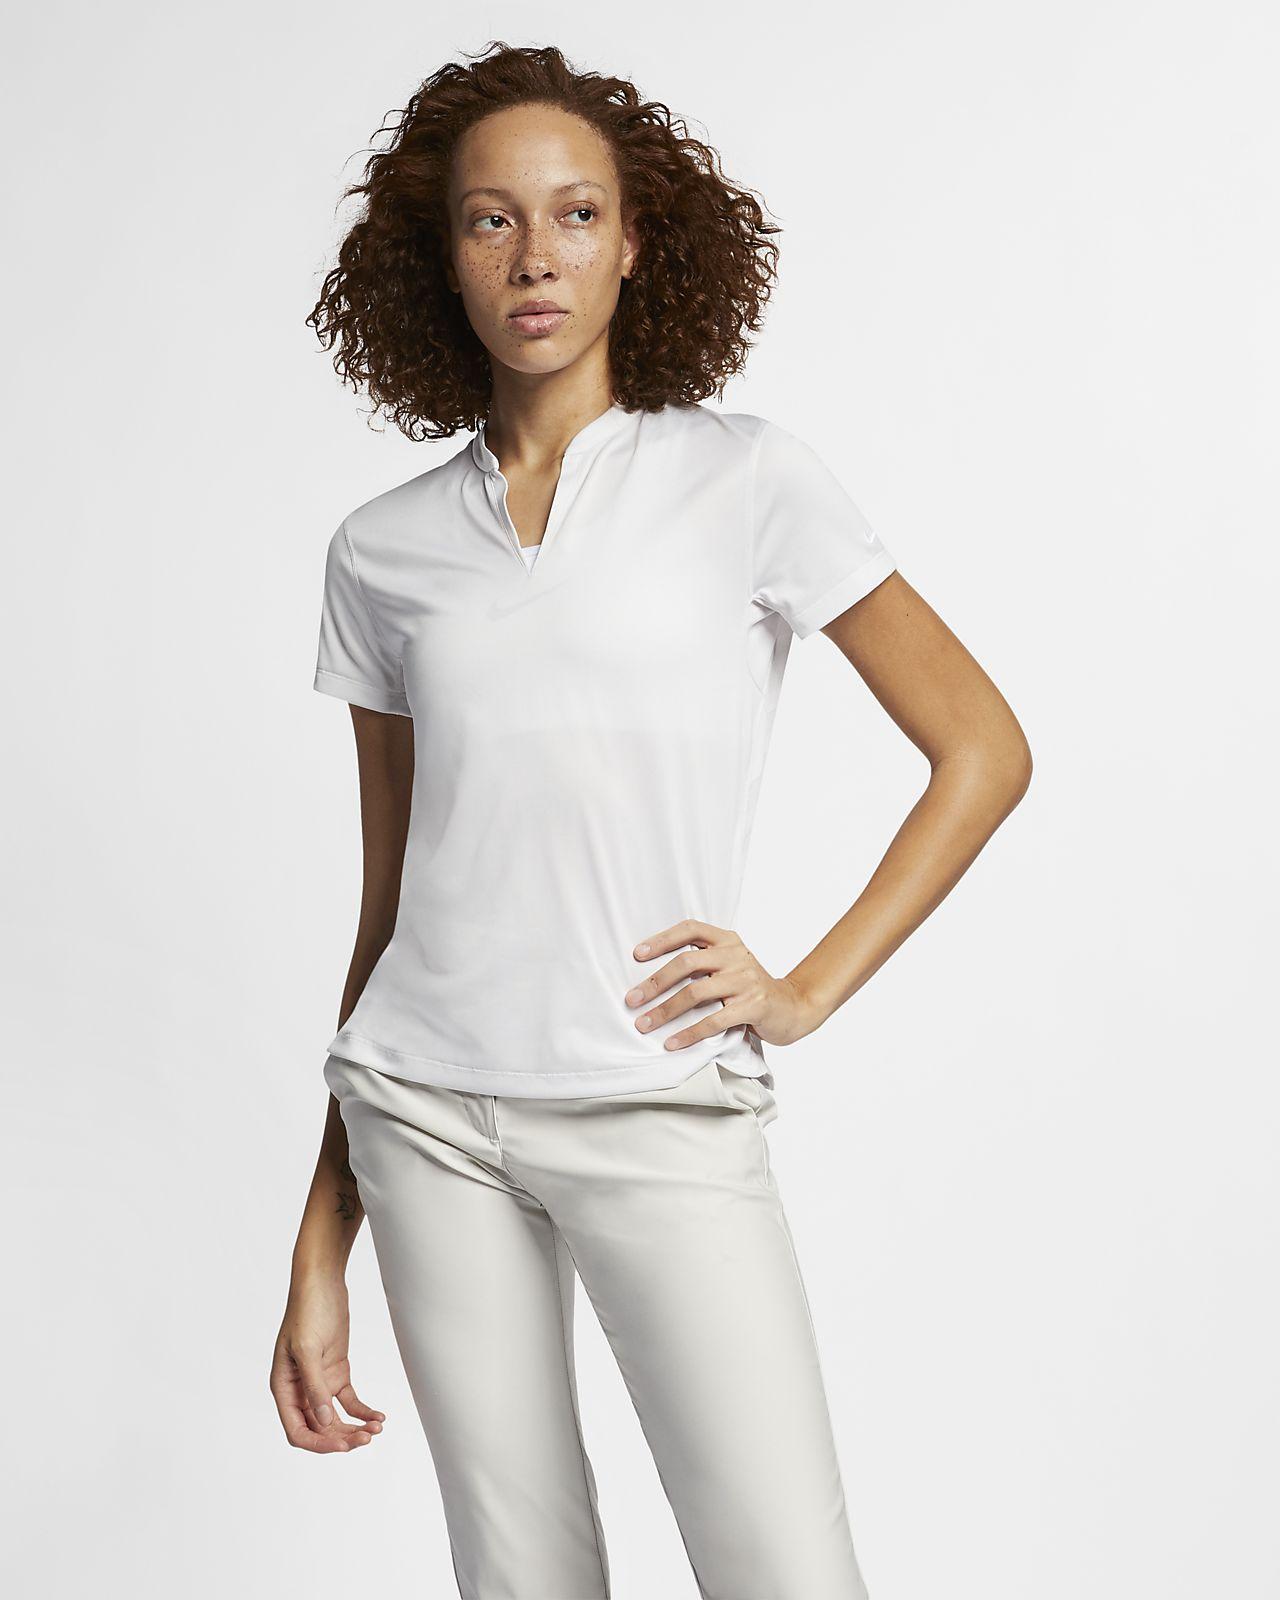 e01202a5ddf1 Γυναικεία μπλούζα πόλο για γκολφ Nike TechKnit Cool. Nike.com GR